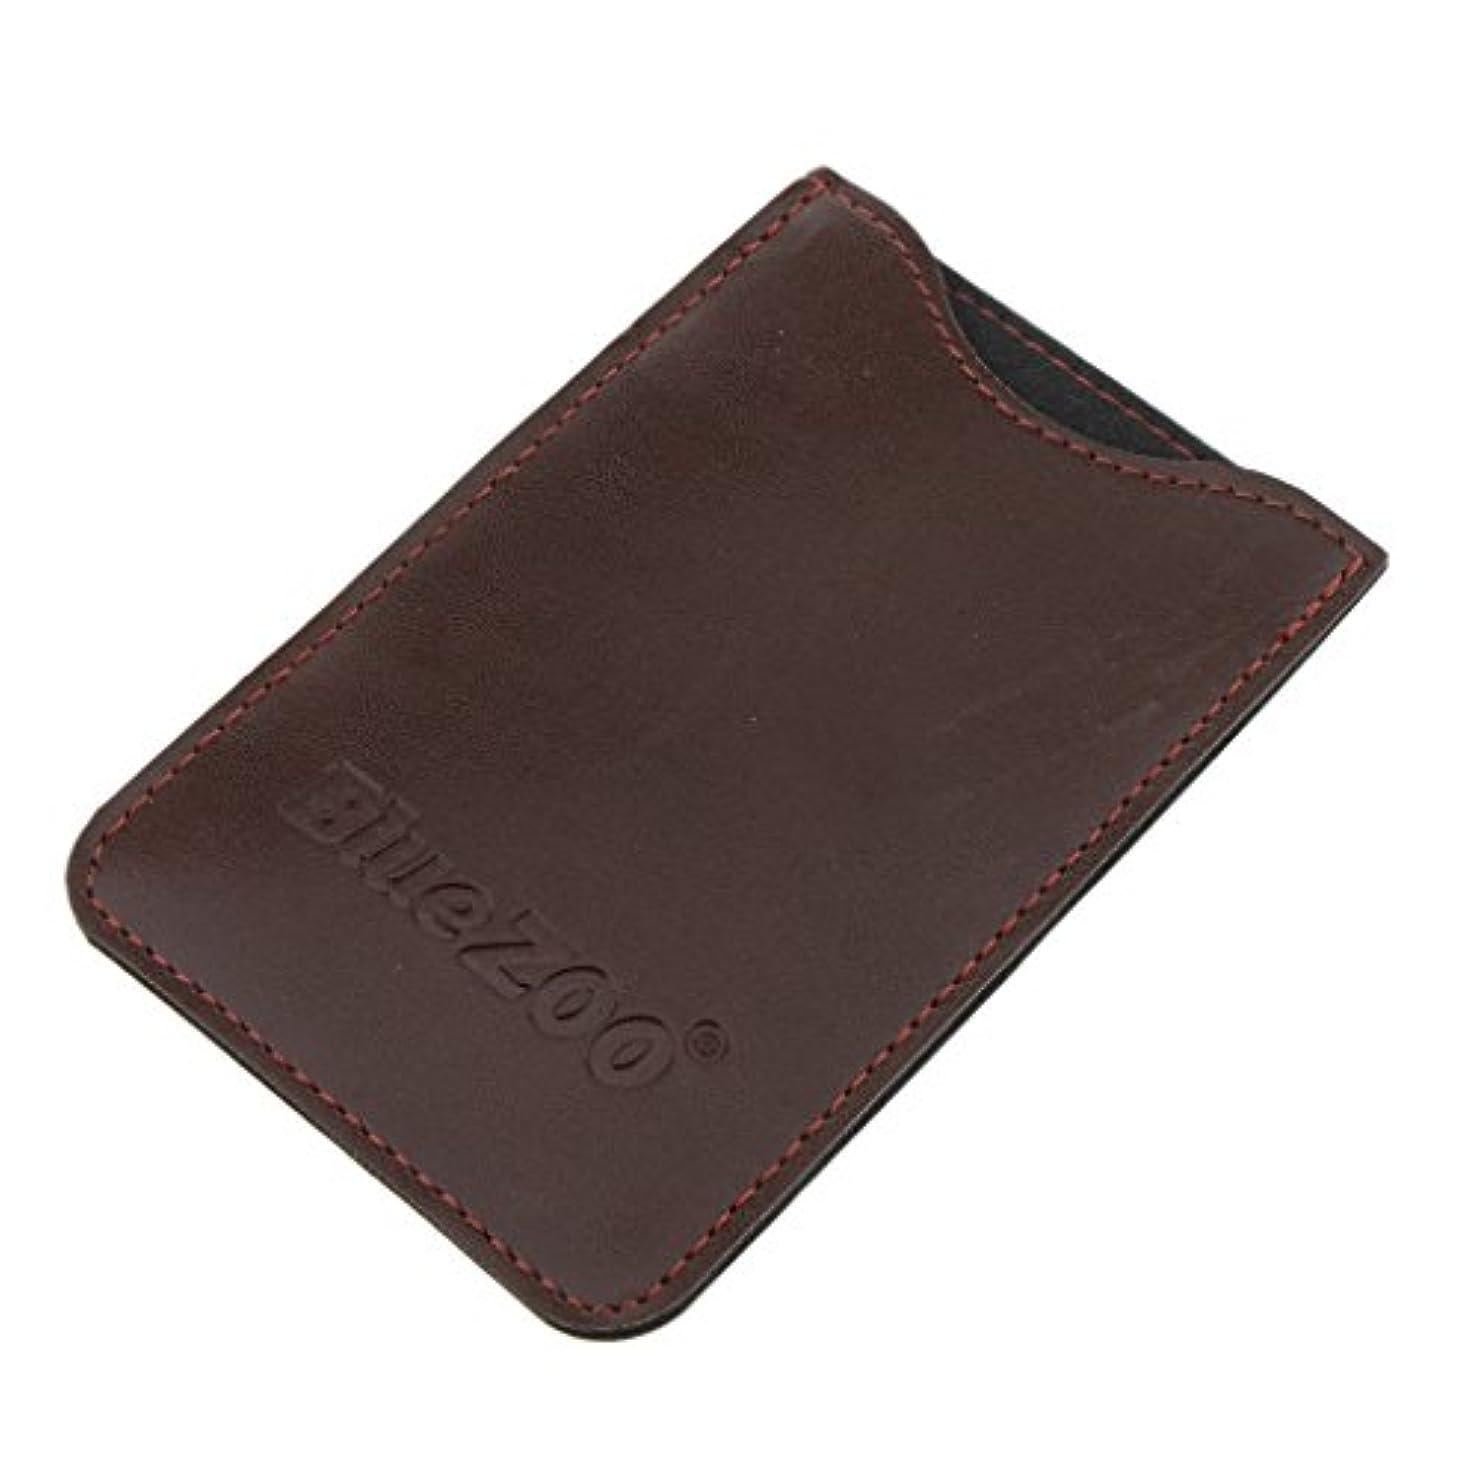 Perfeclan コンビバッグ PUレザー 櫛バッグ ポケット オーガナイザー 収納ケース 保護カバー パック 全2色 - 褐色